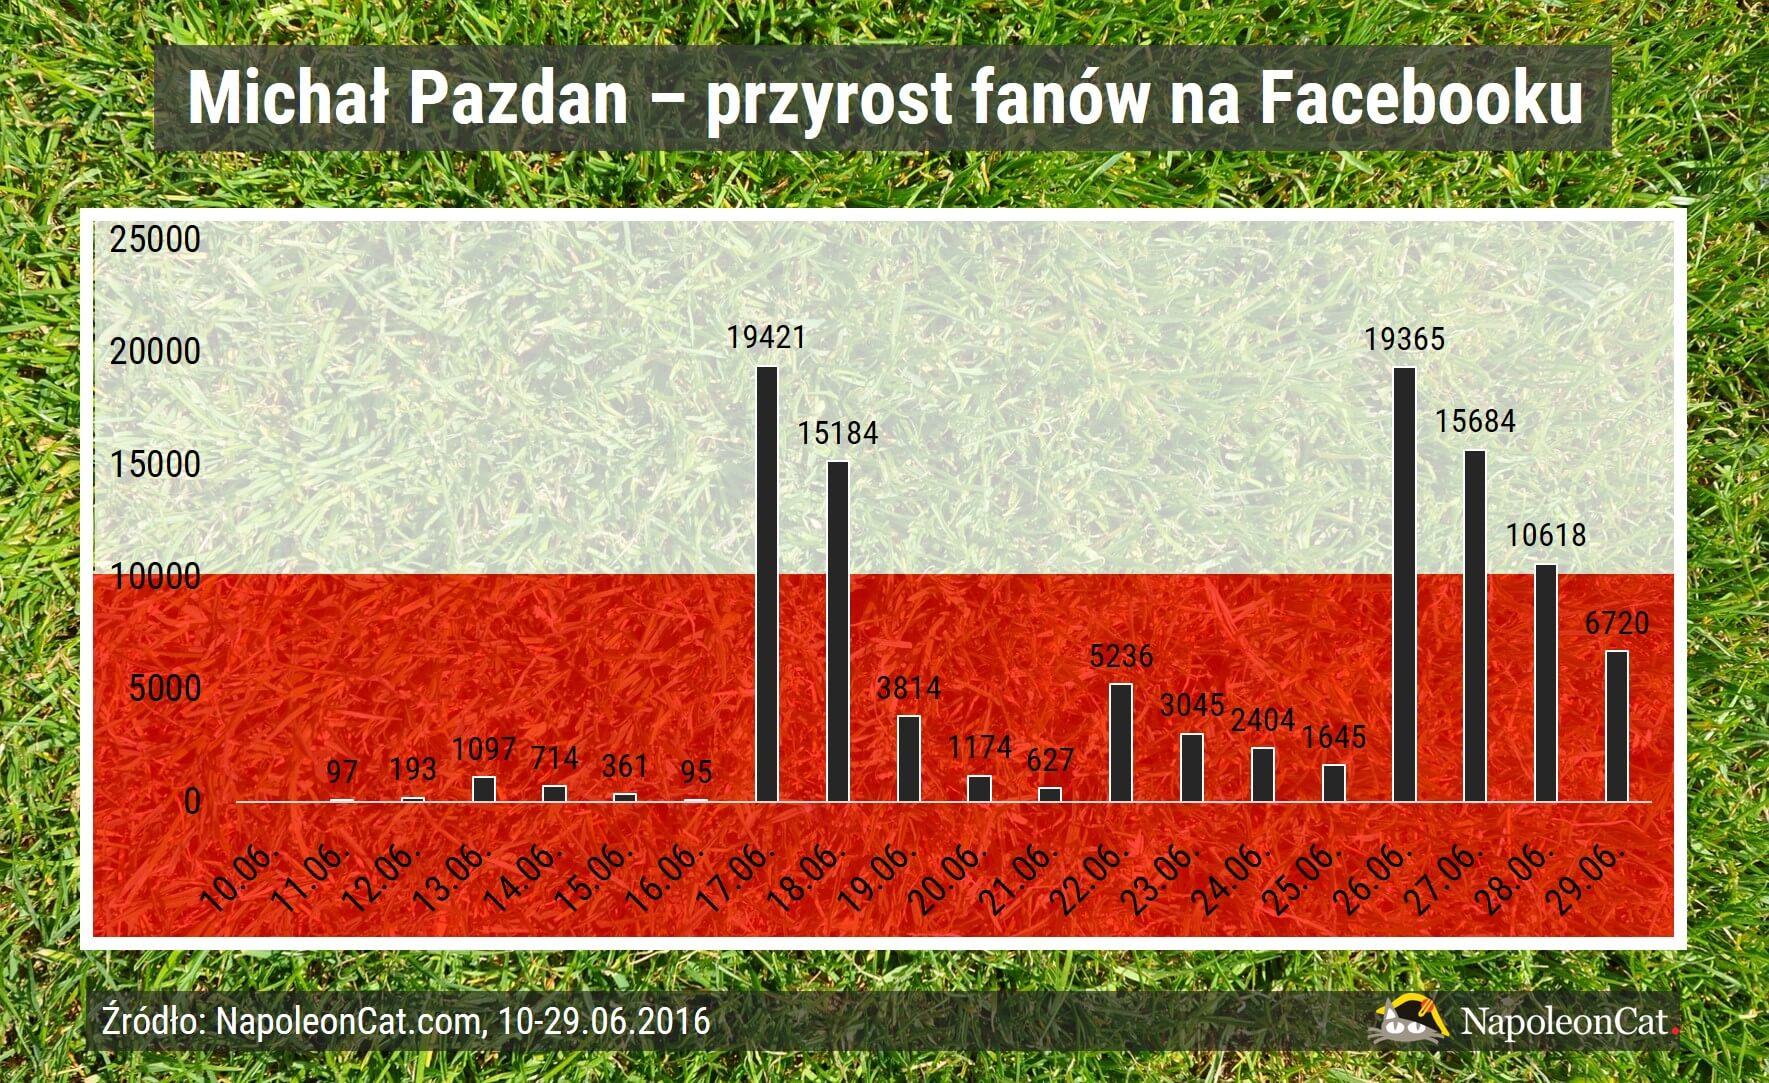 Michal Pazdan_Facebook_fani dziennie_10-29.06.2016_dane NapoleonCat